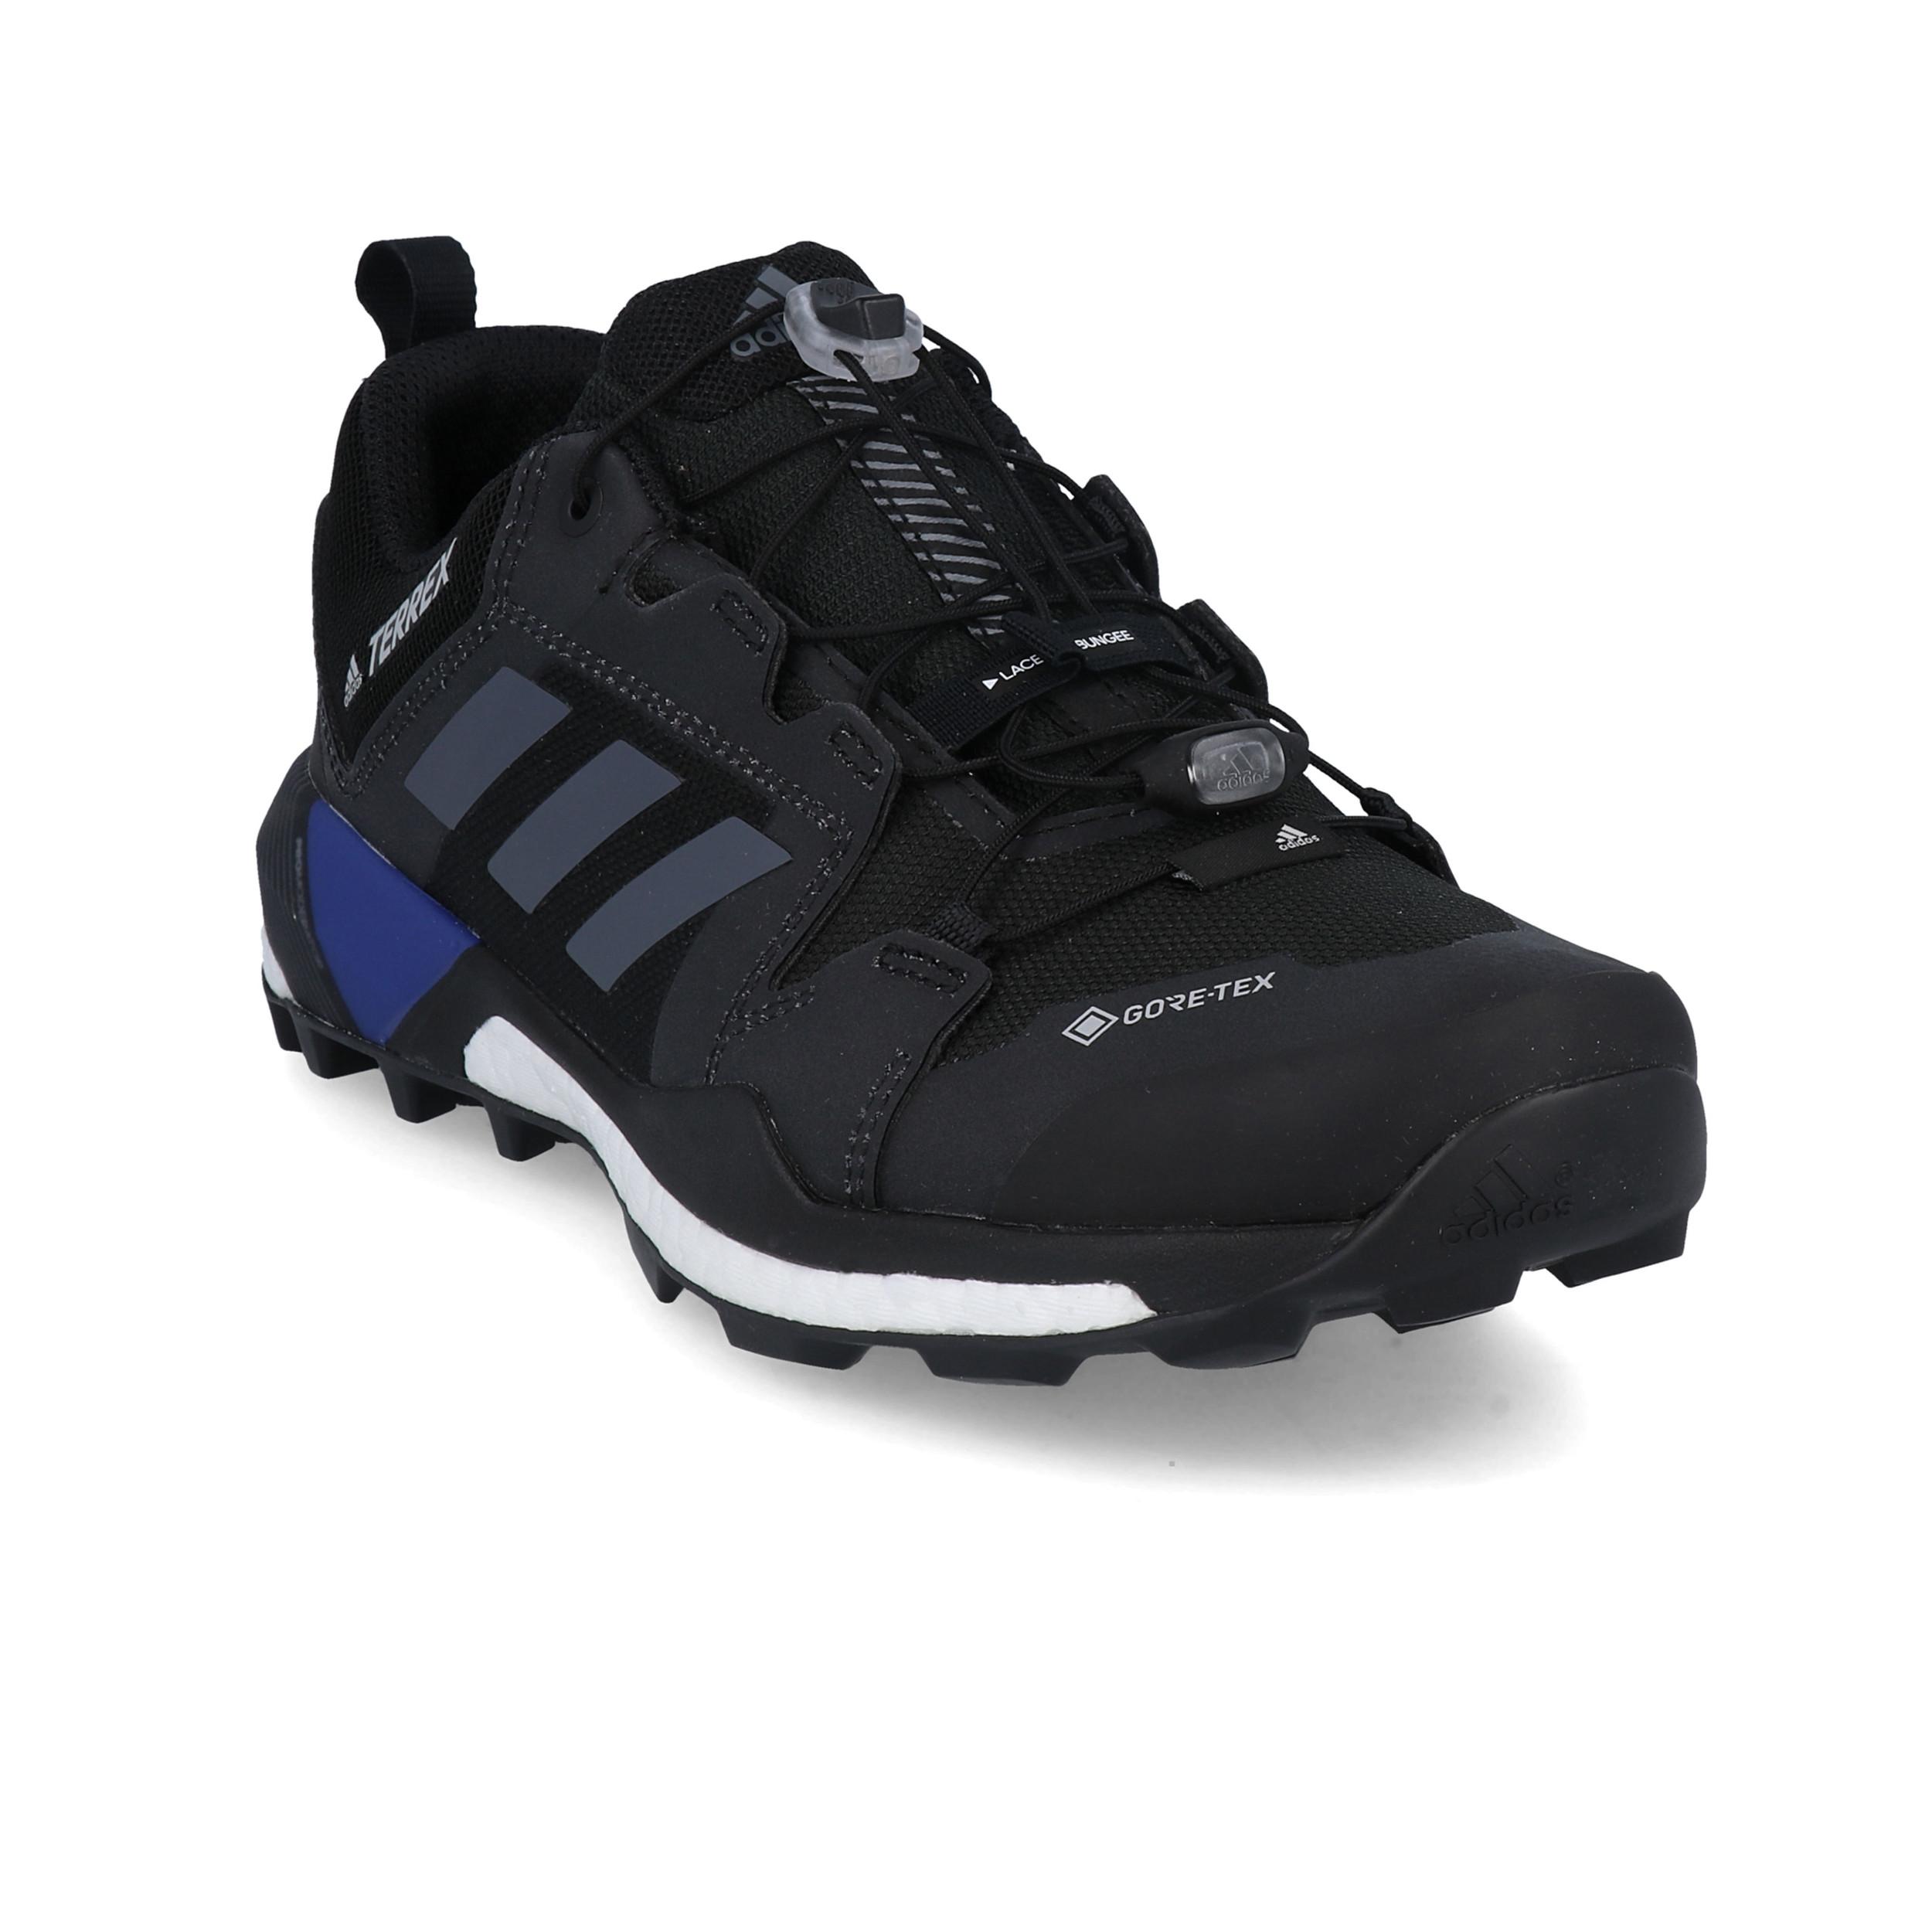 ADIDAS-Da-Uomo-Terrex-skychaser-XT-GORE-TEX-TRAIL-RUNNING-scarpe-da-ginnastica miniatura 35